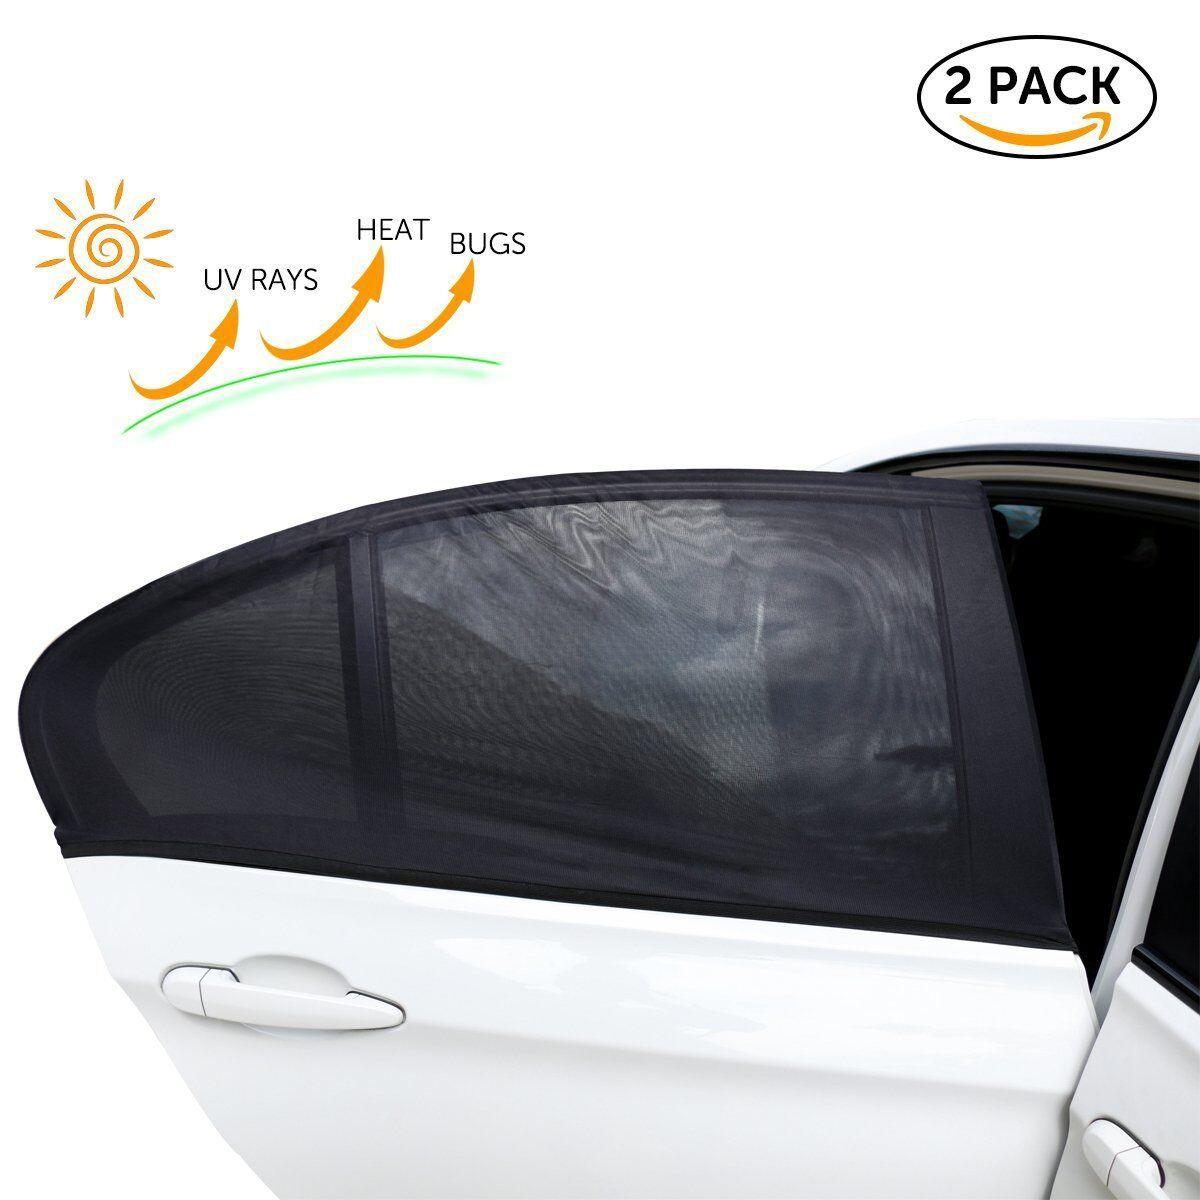 2X Universal Car Rear Window Sun Shade Blind Mesh Cover Screen Kid Child Protect